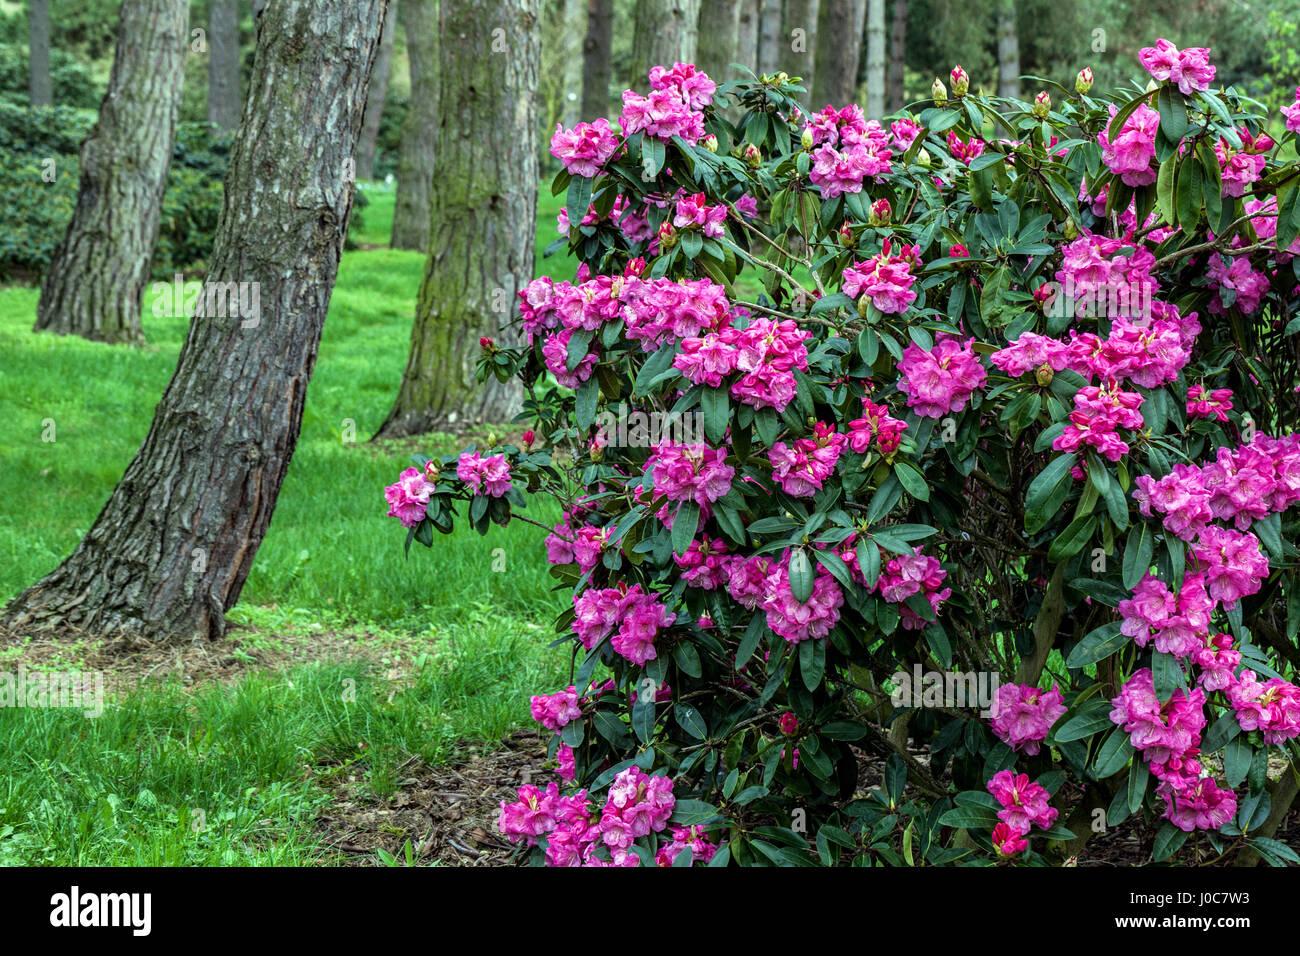 Rhododendron 'Loket', Wald Strauch Stockbild